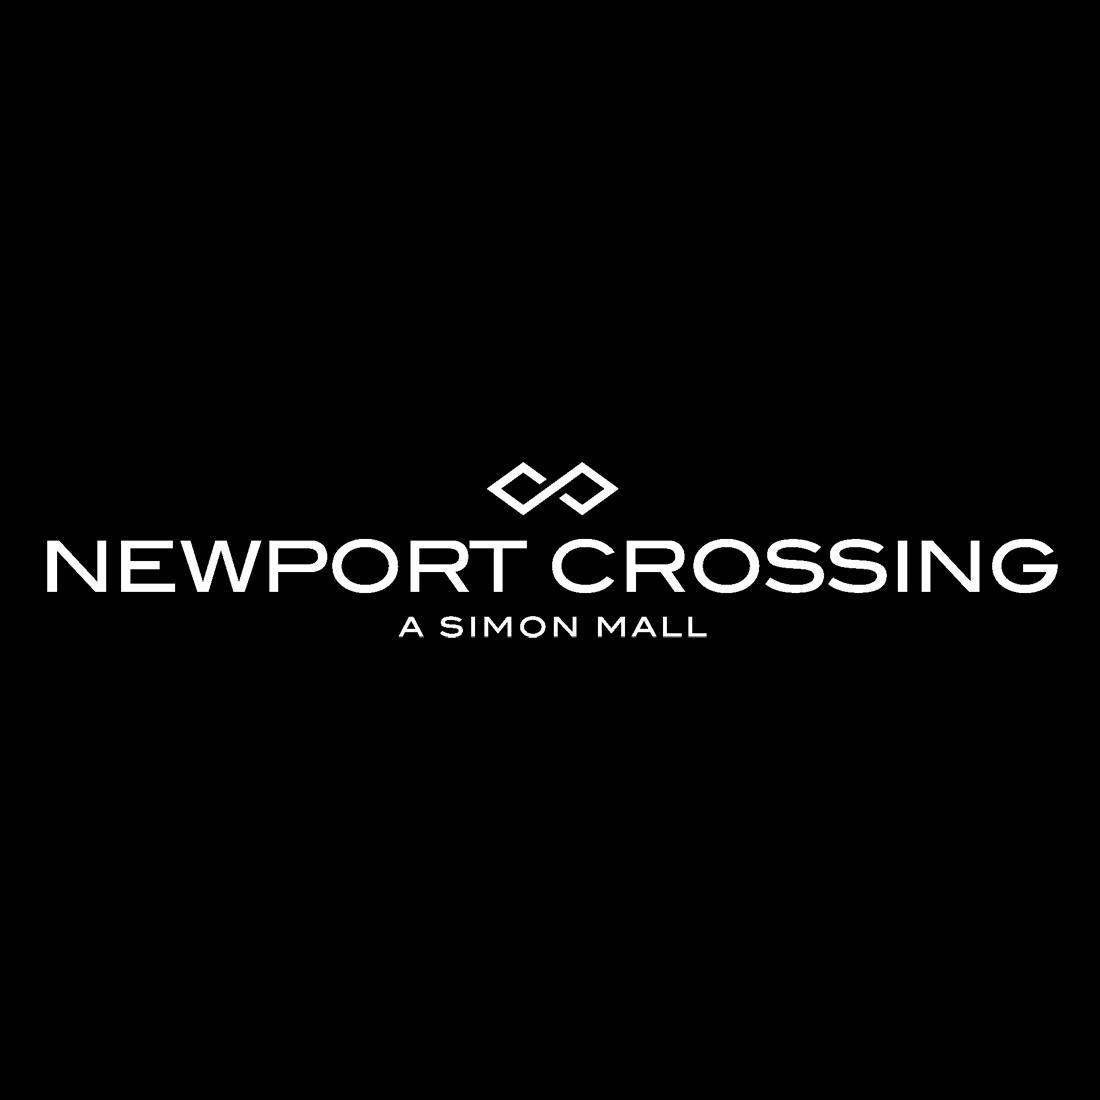 Newport Crossing